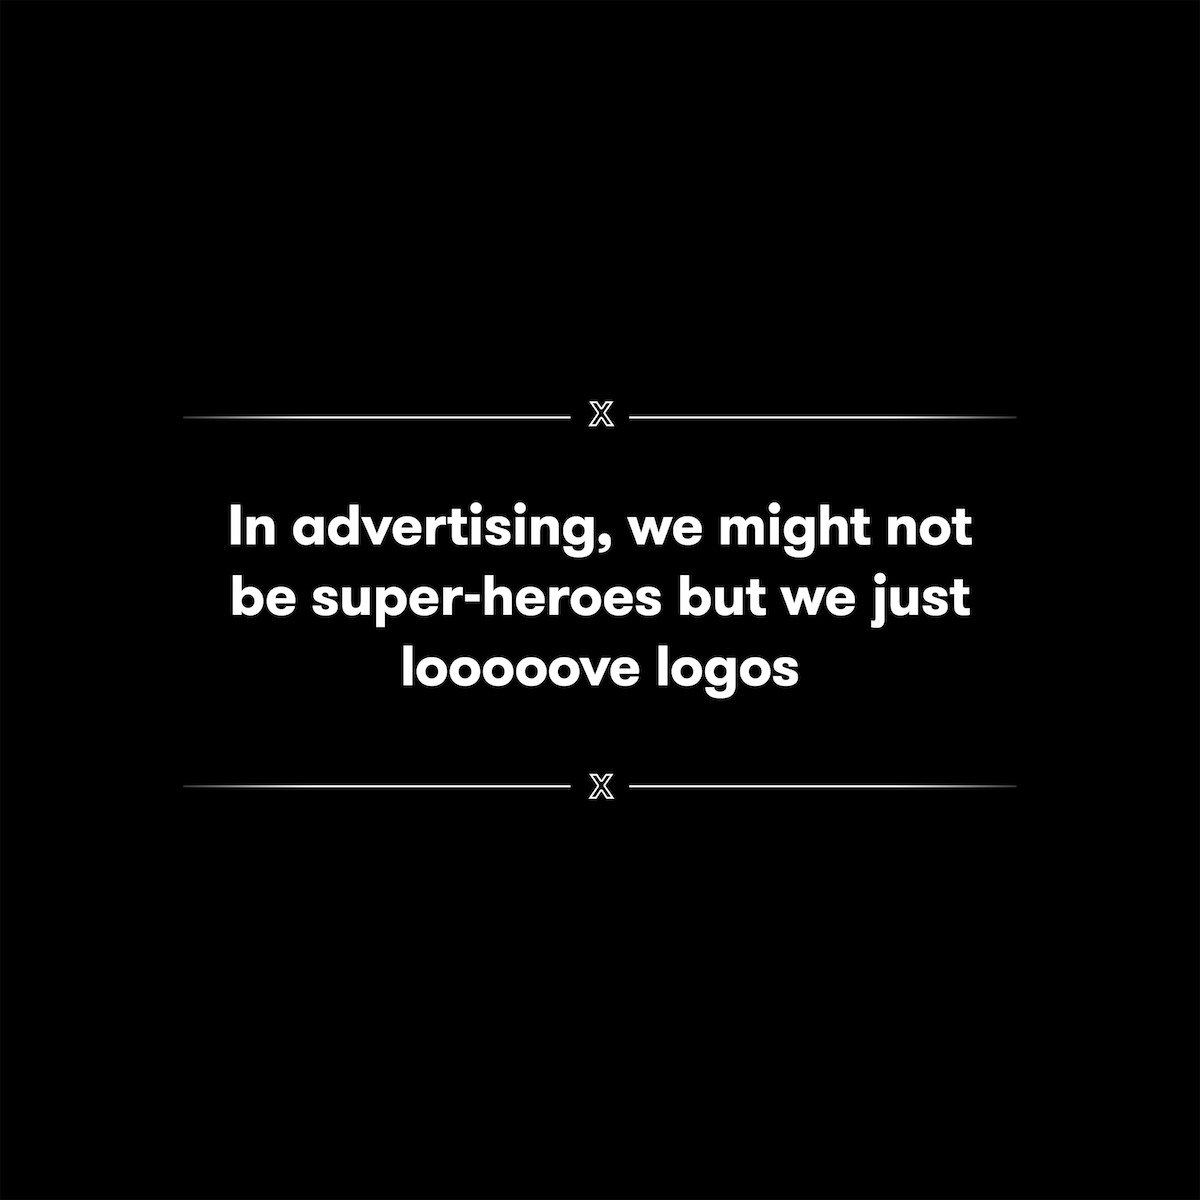 Superhero Logos for creative agency job titles -